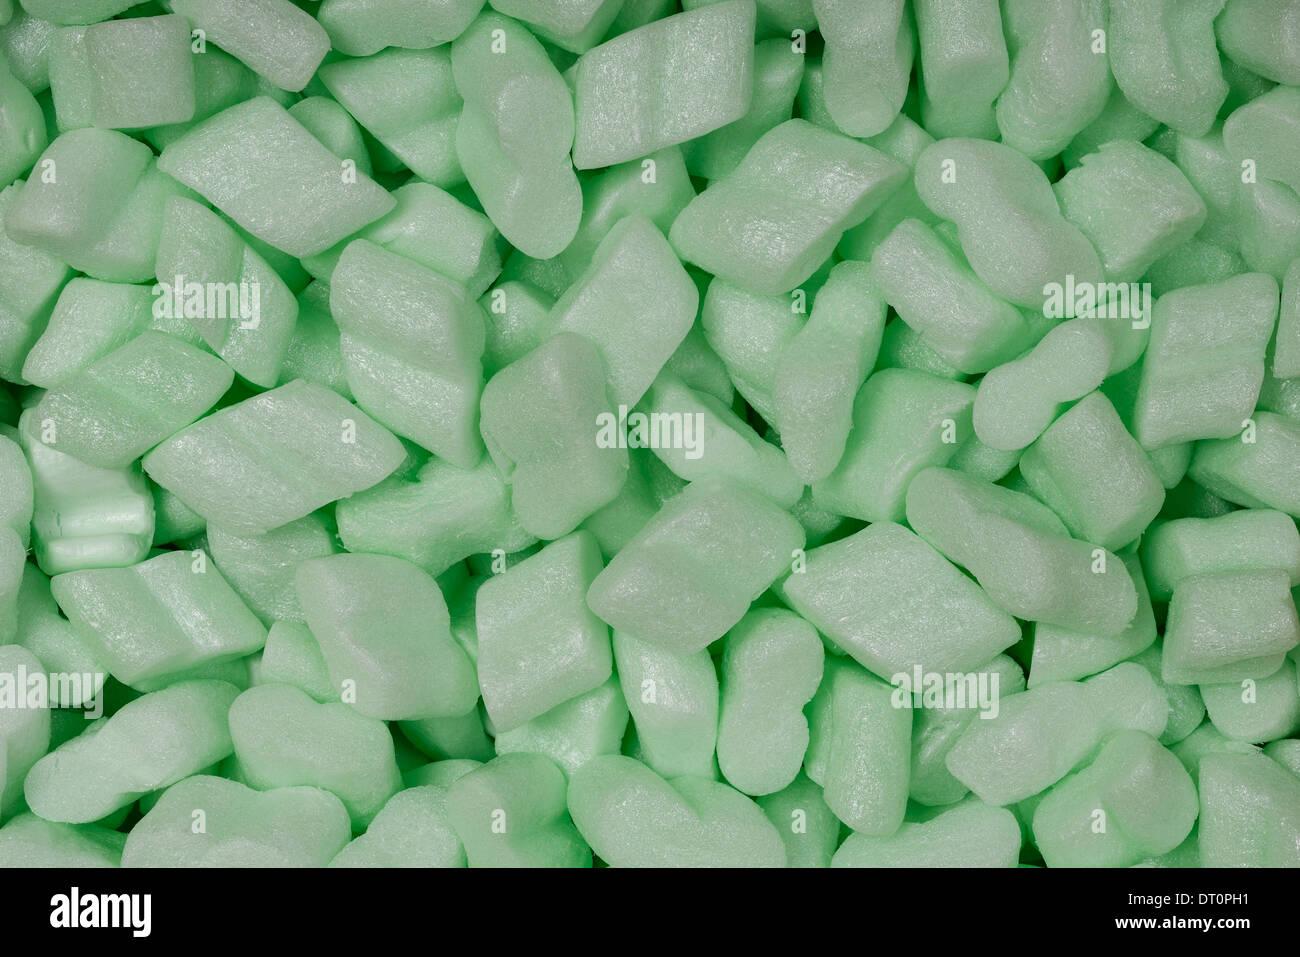 La fécula de maíz verde cacahuetes material de embalaje Imagen De Stock